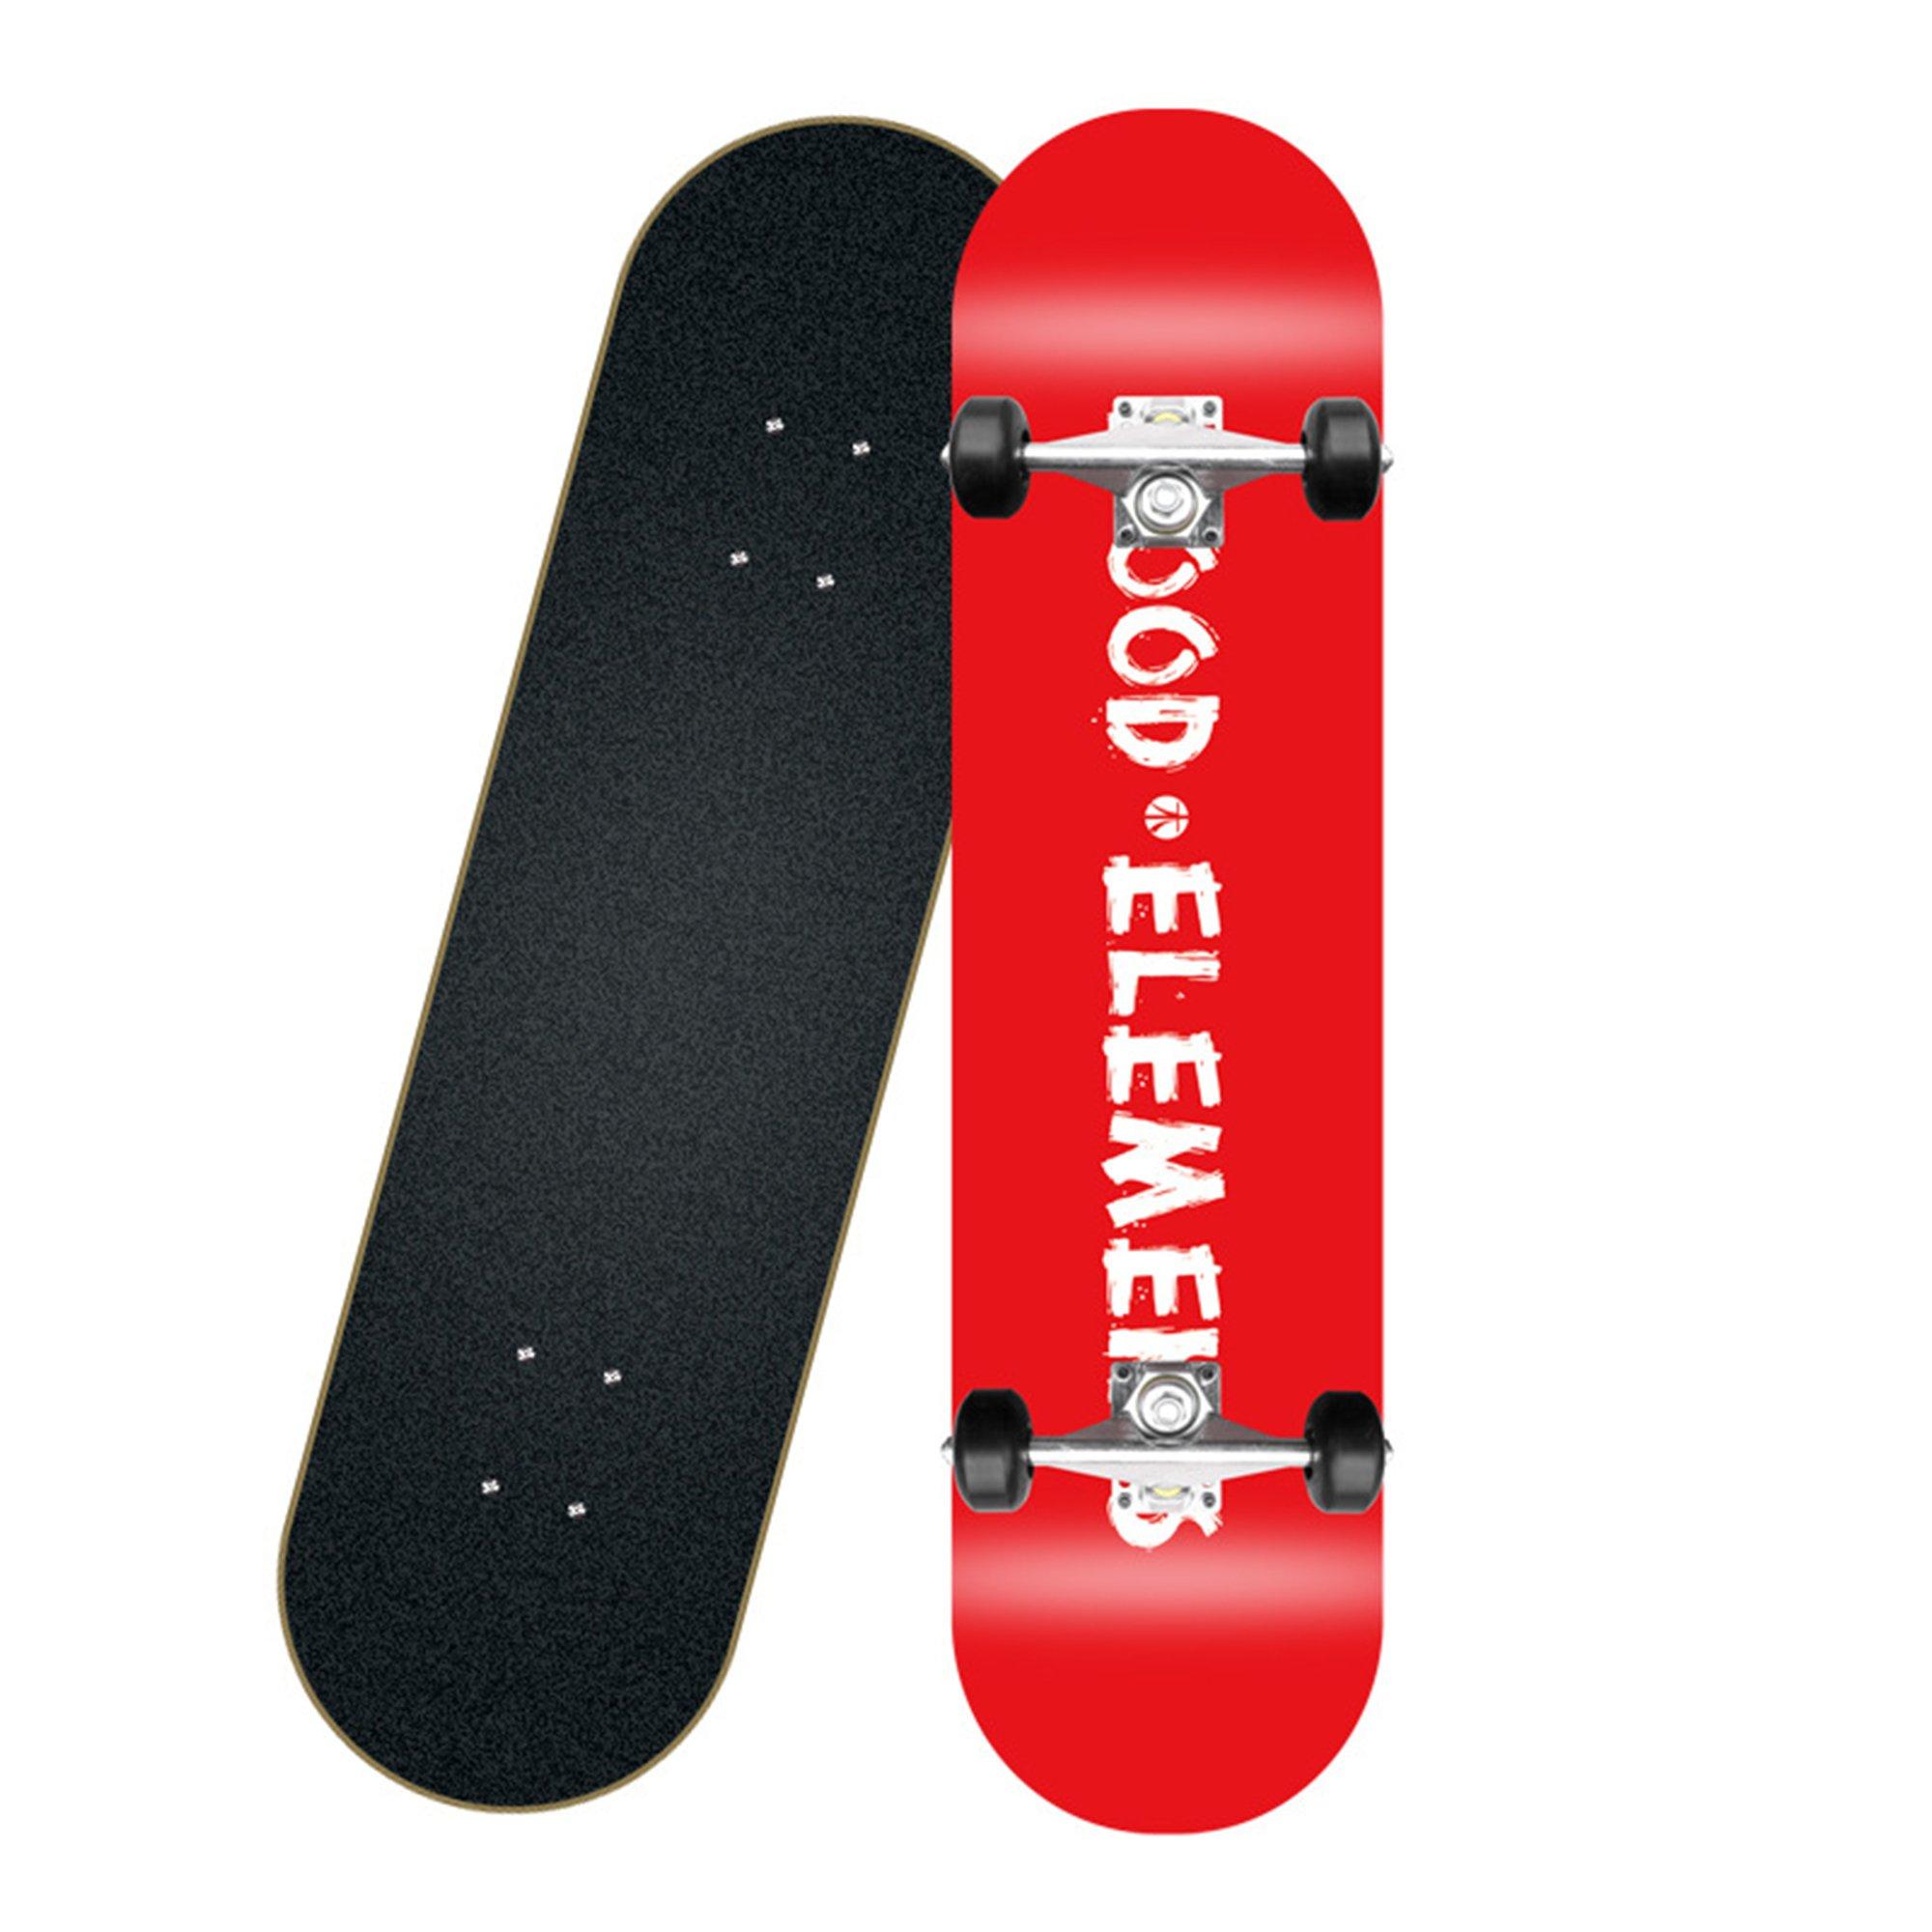 8 Layer Maple Wood Deck Skateboard